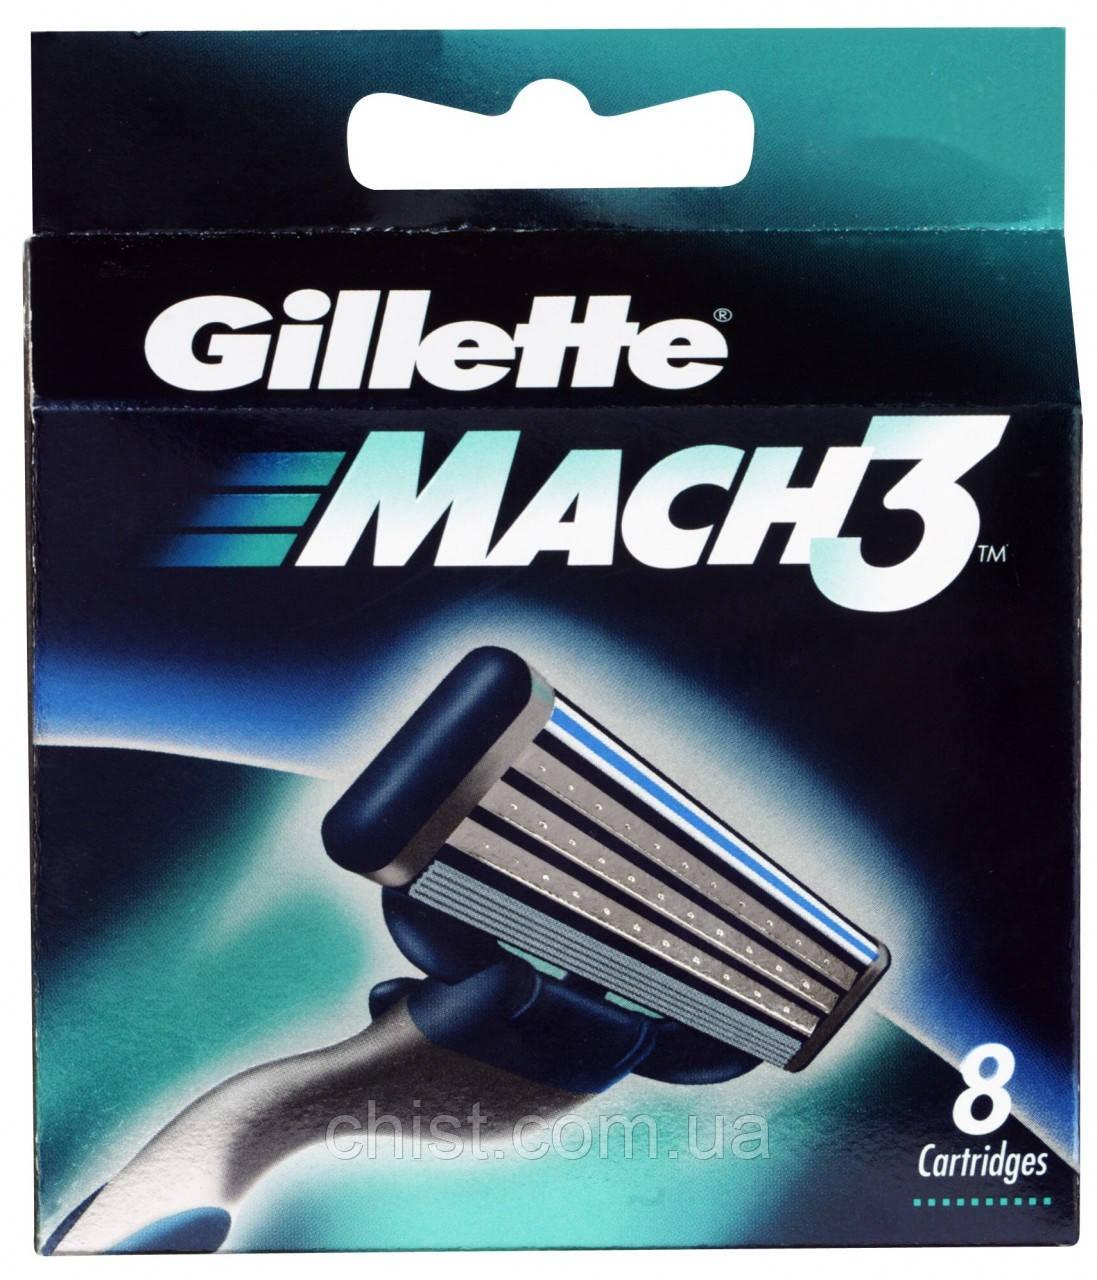 "Gillette Mach-3,Картриджи (8 шт) - ""Идеал Чист"" в Одессе"